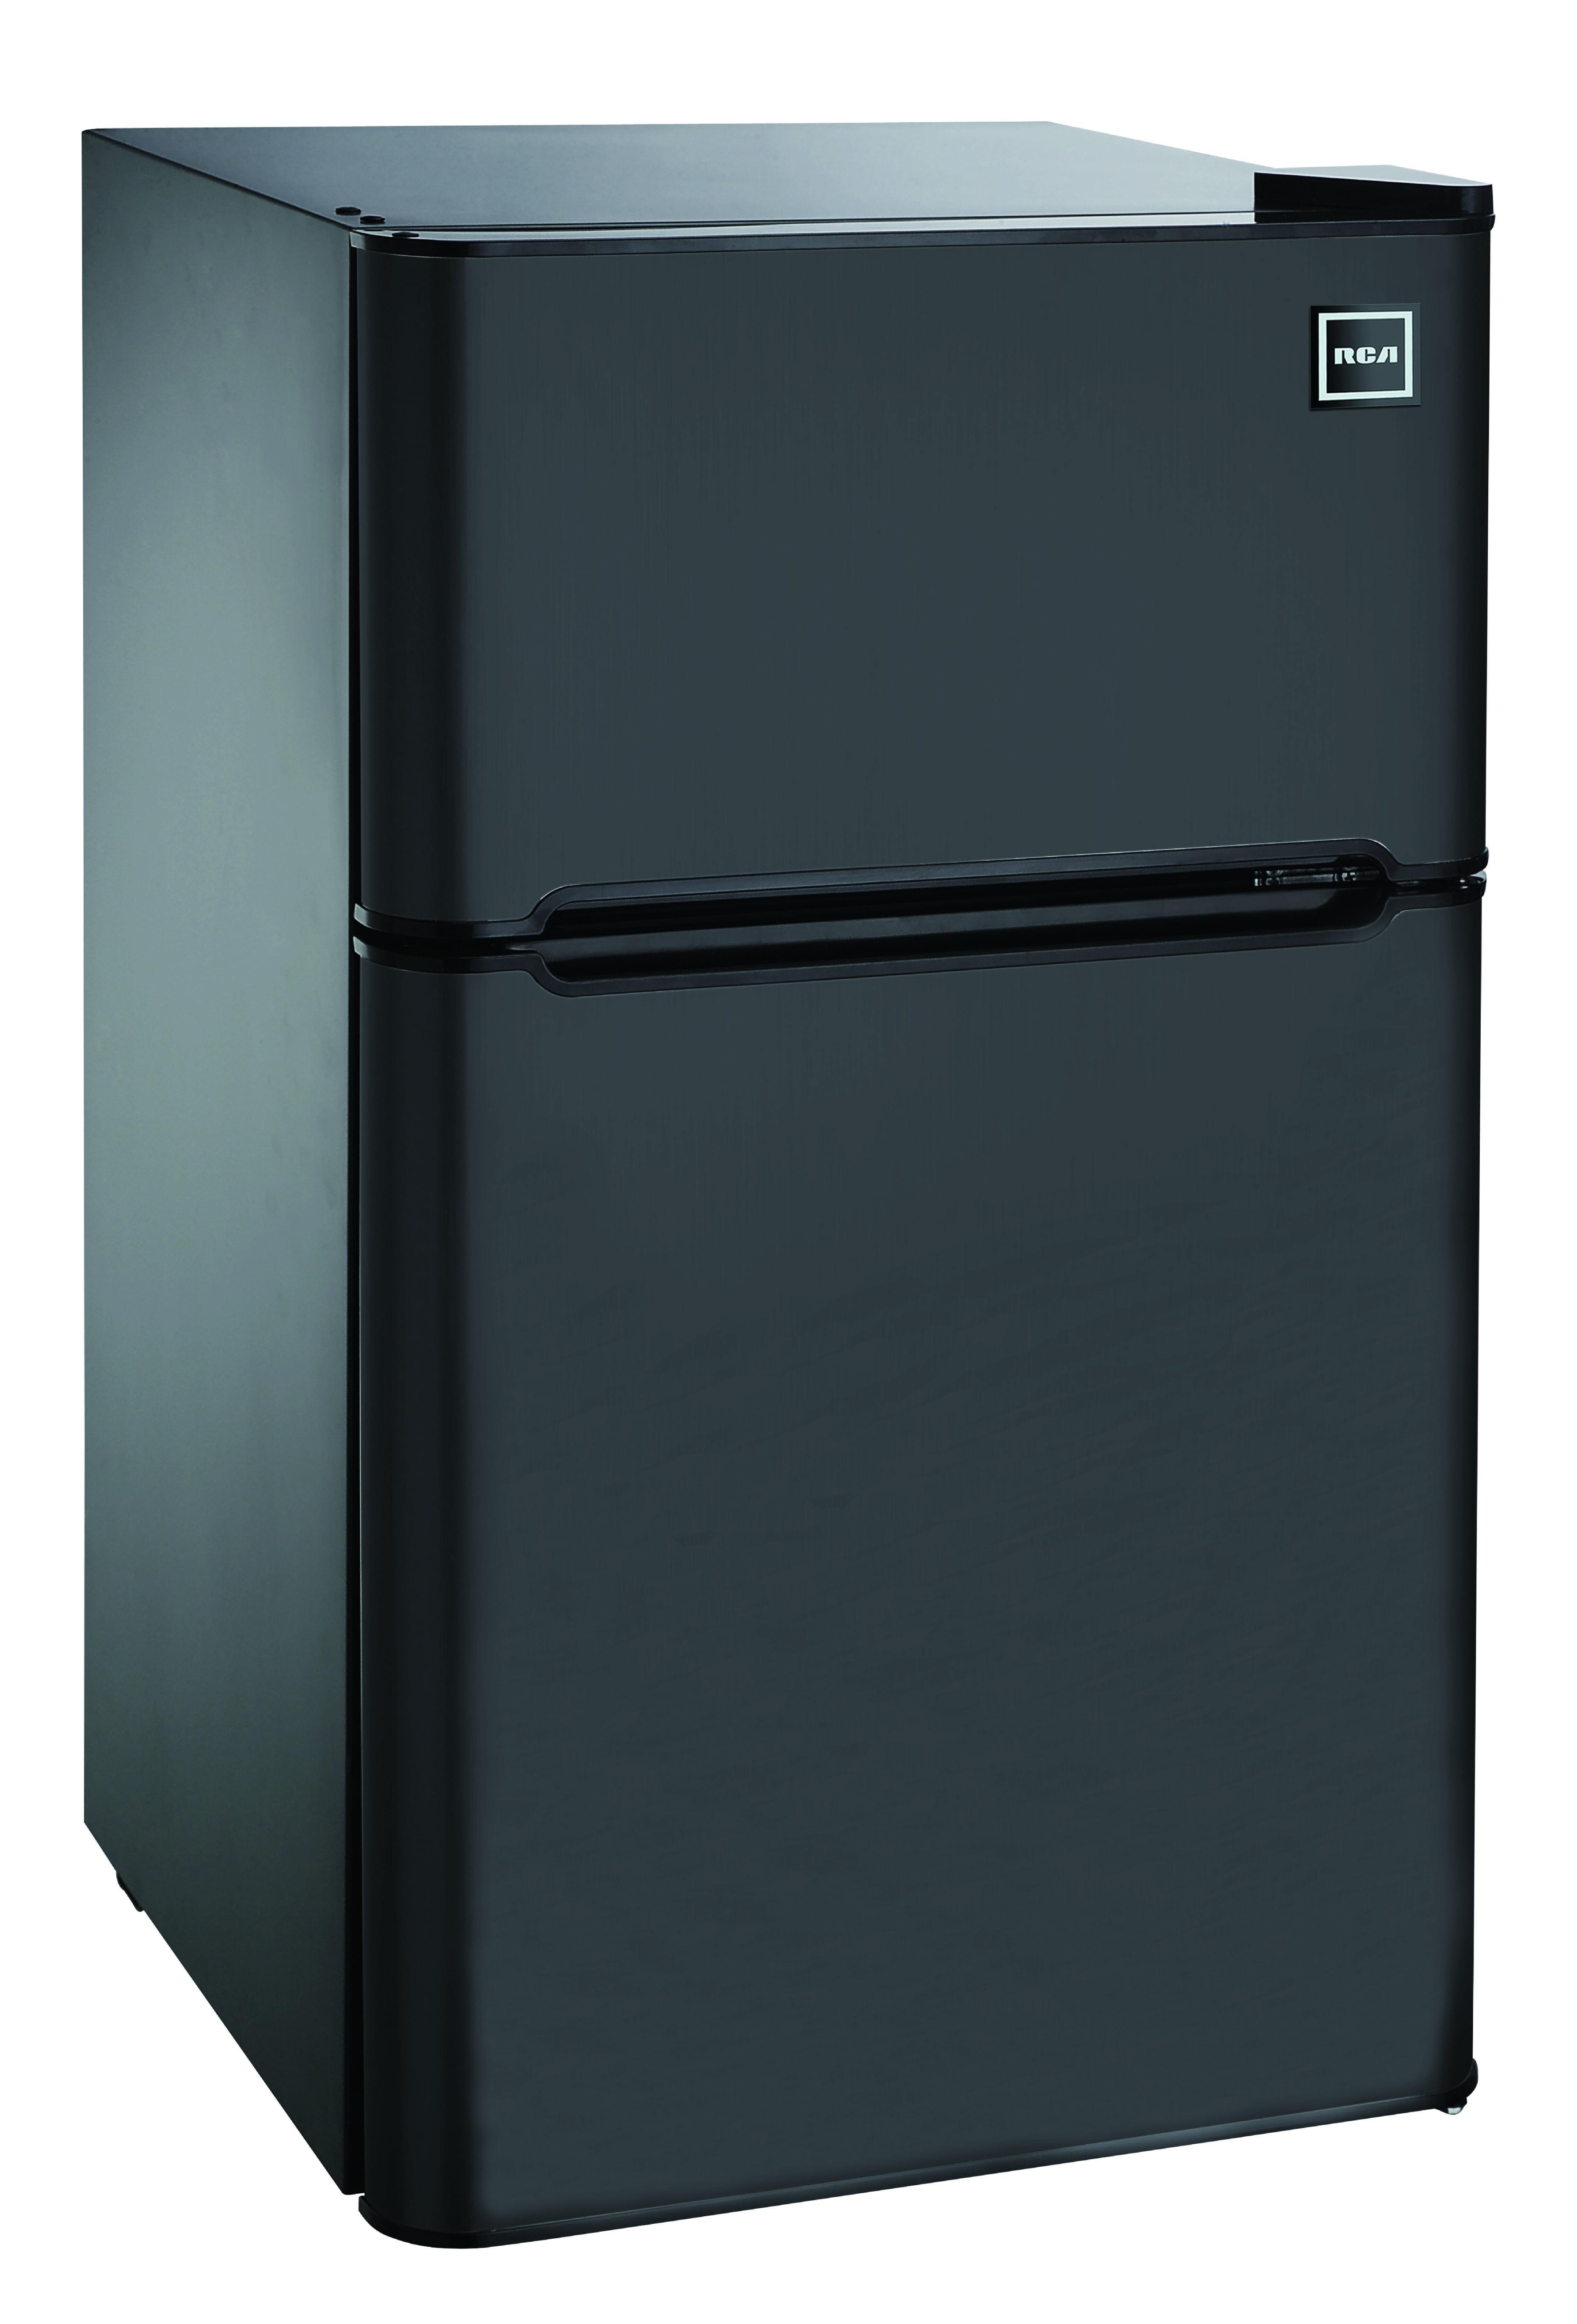 RCA 3.2 Cu Ft Two Door Mini Fridge with Freezer RFR832, Black